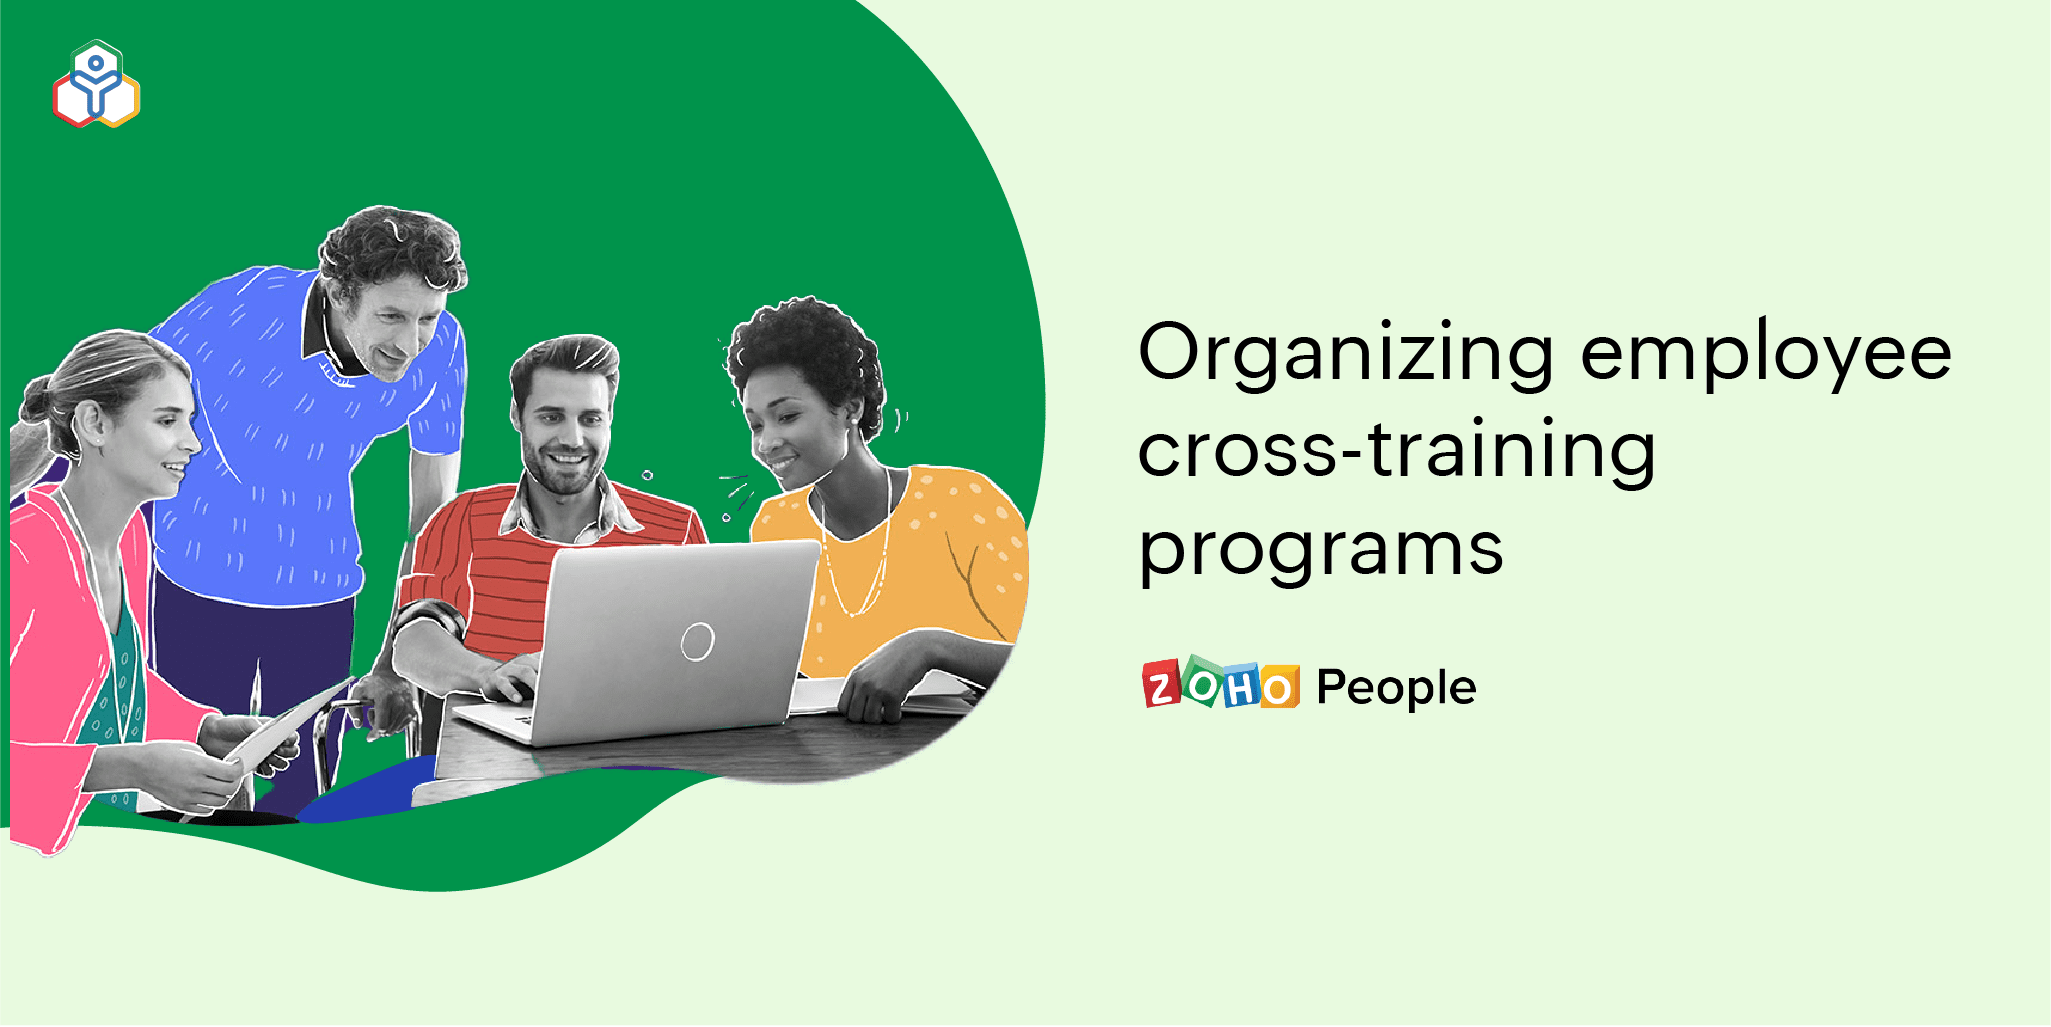 5 tips for conducting employee cross-training programs